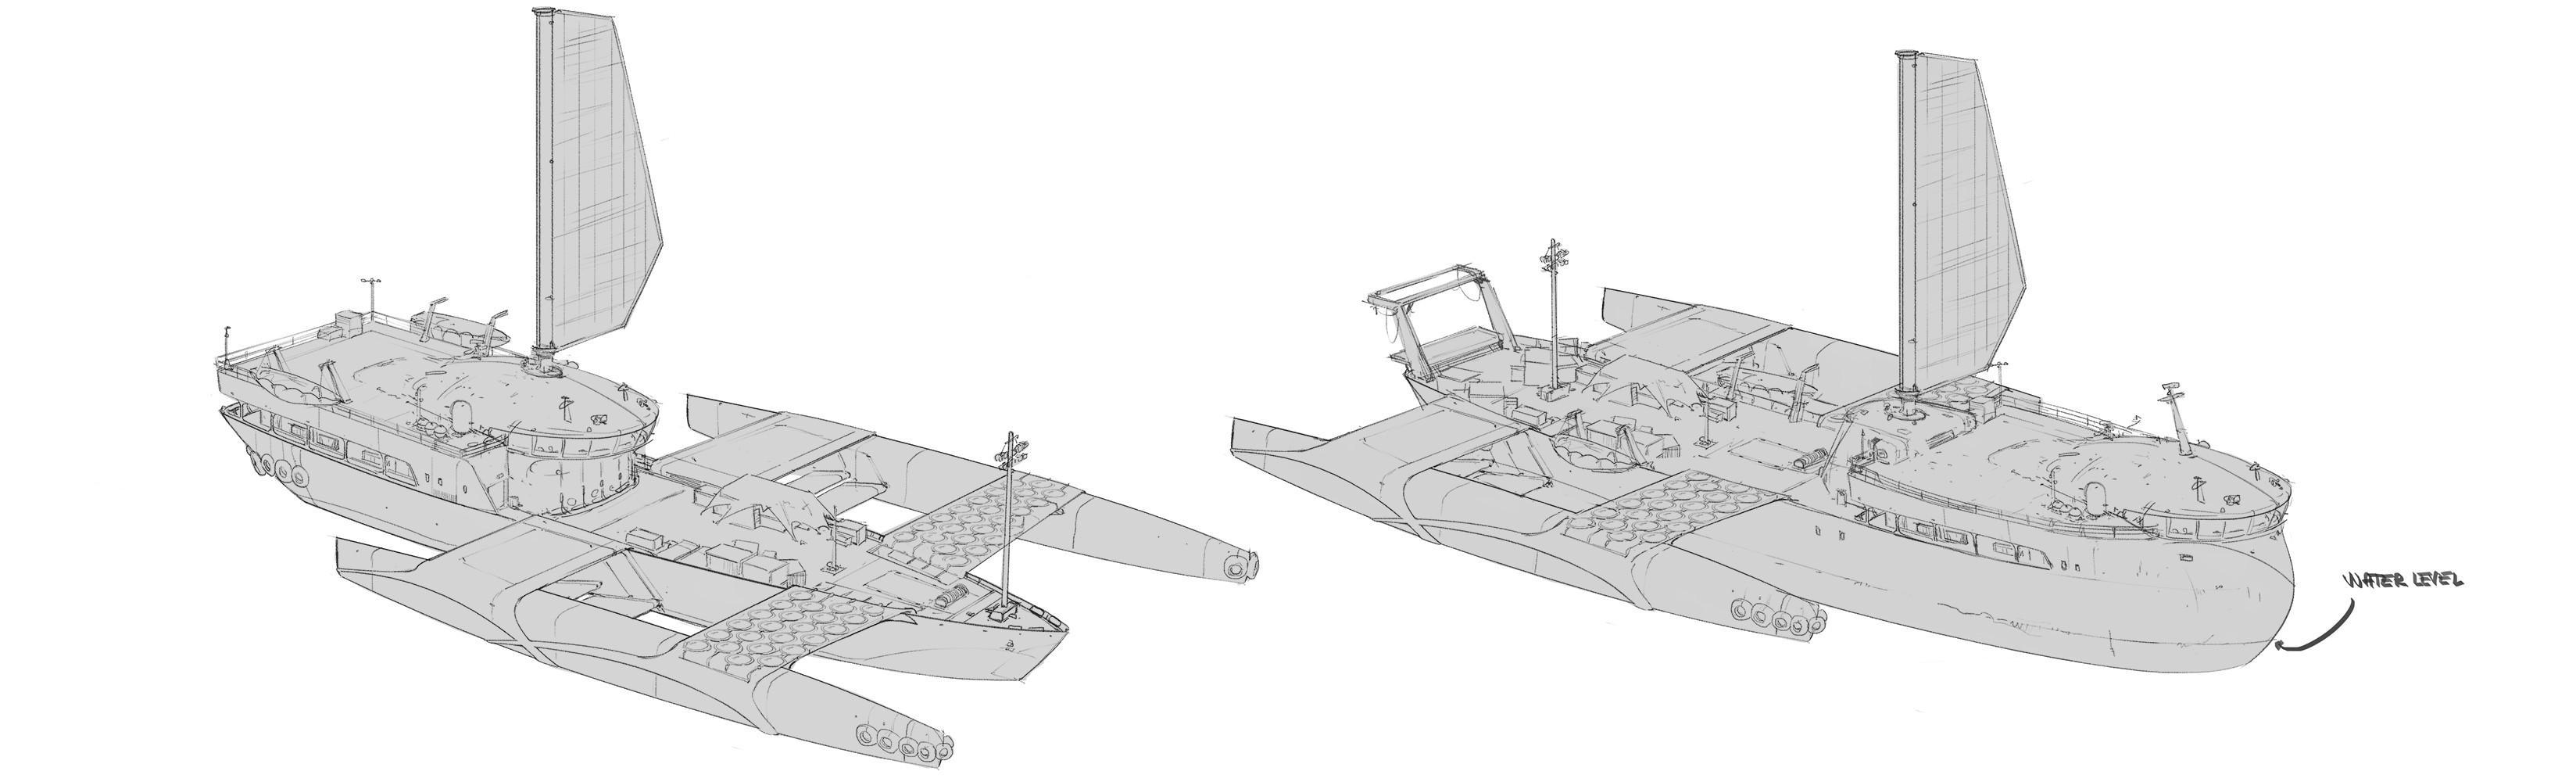 RaftBoat sketches